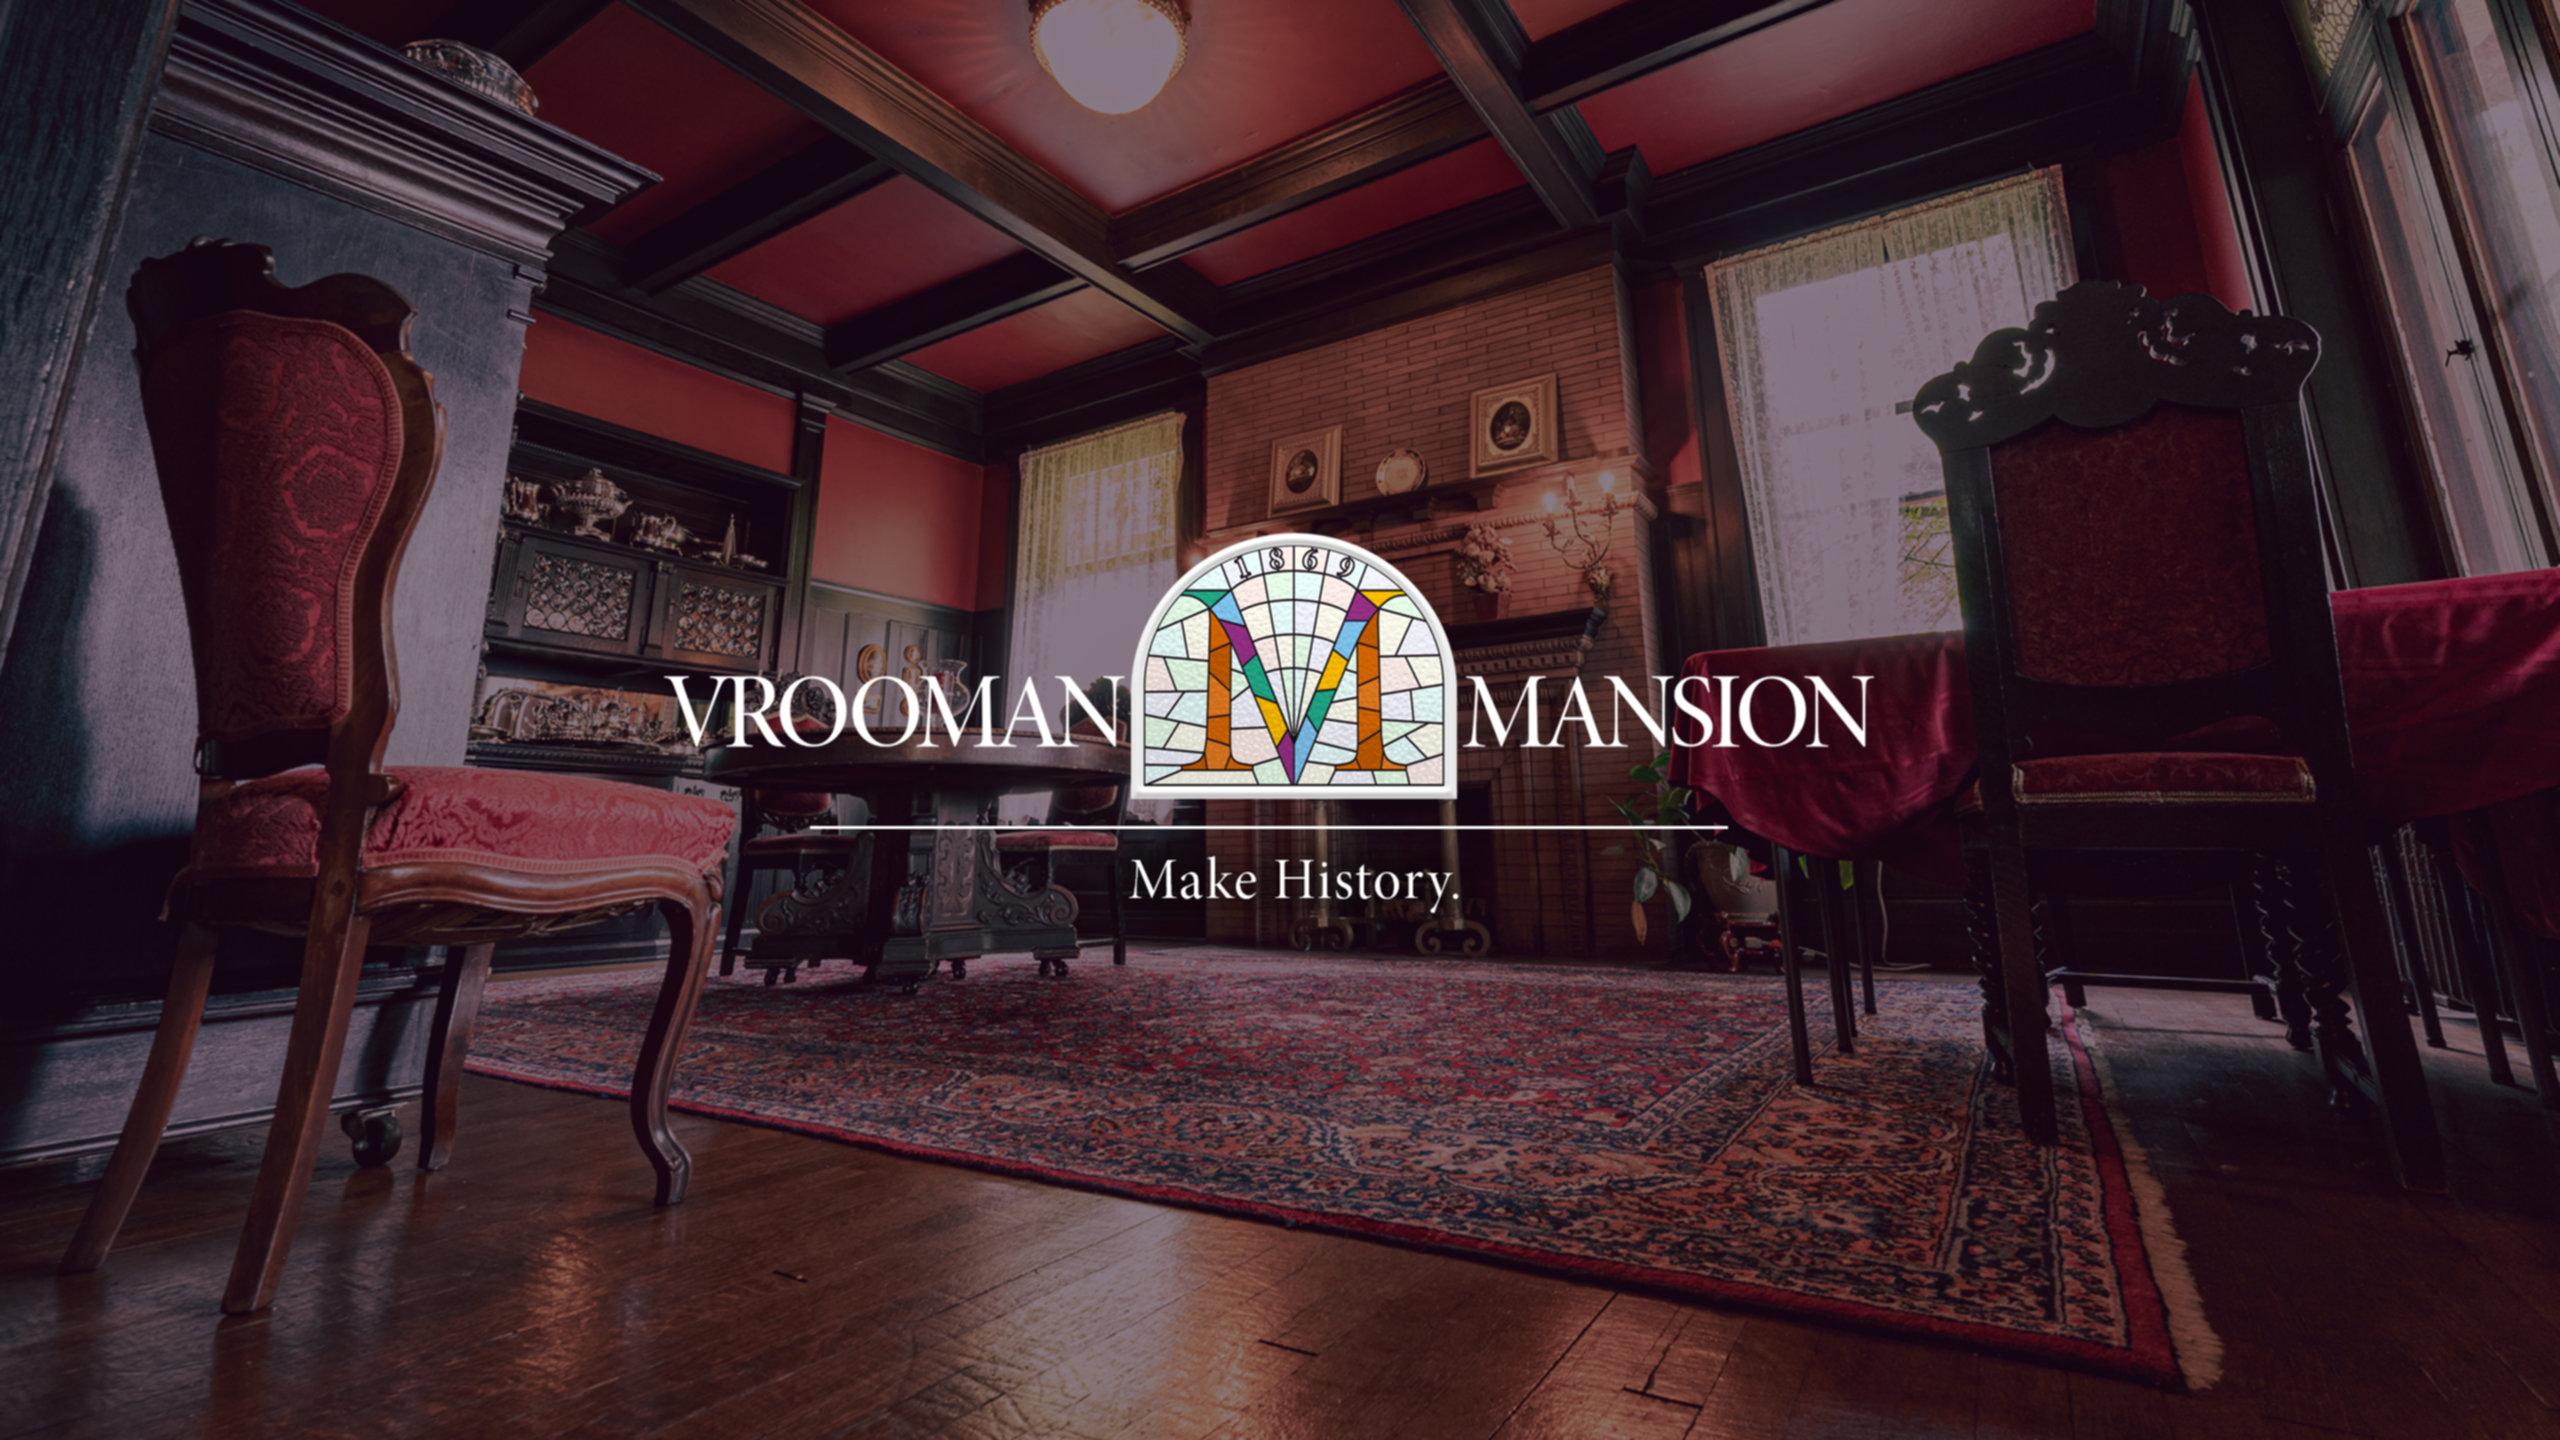 Vrooman Mansion